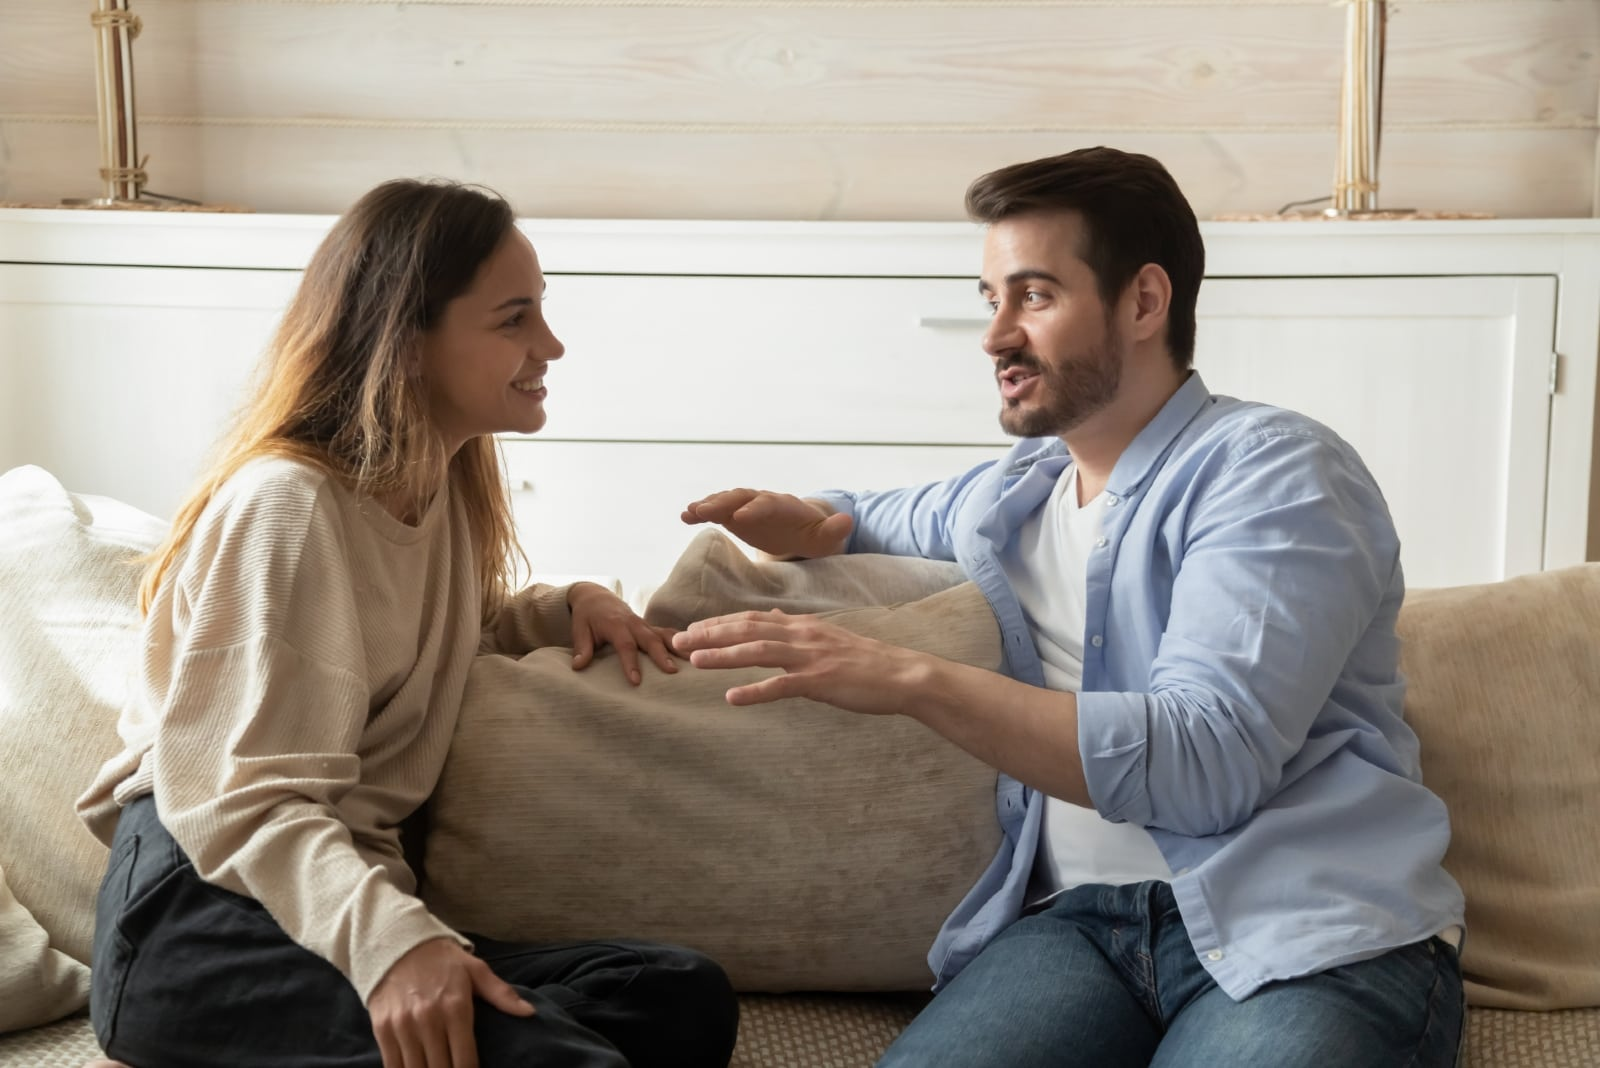 man talking to woman while sitting on sofa